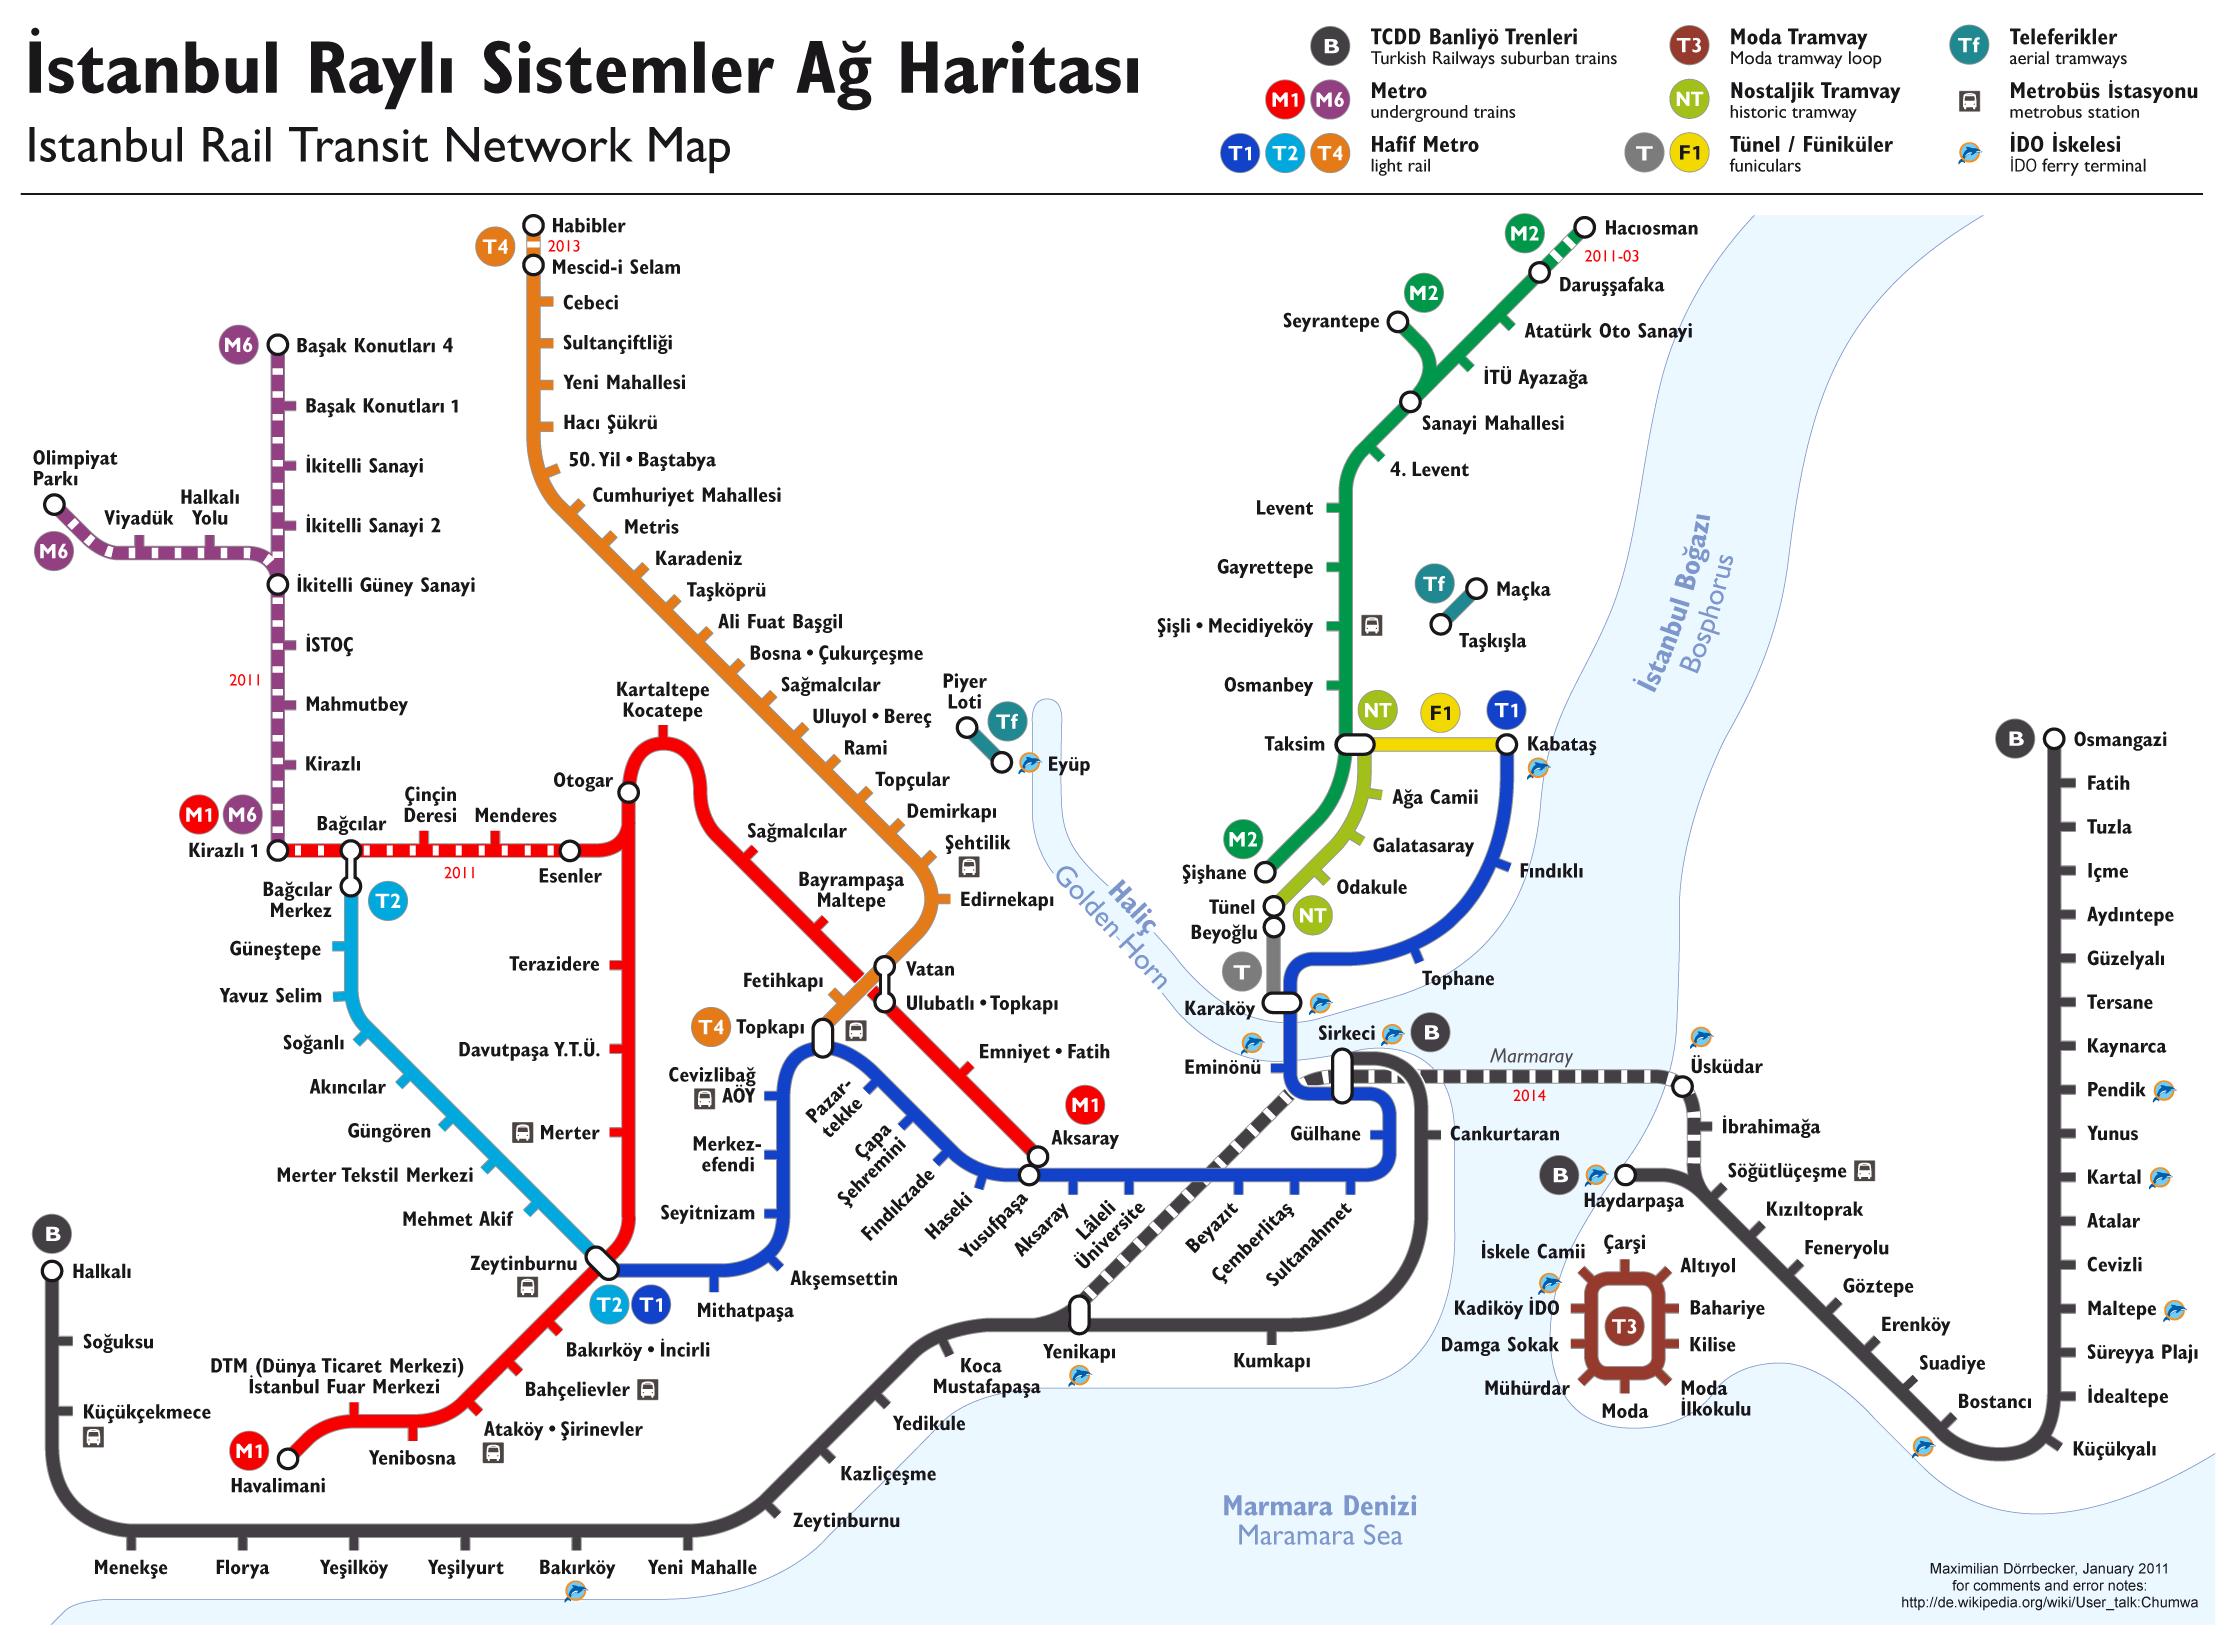 Mapa Transporte de Istambul